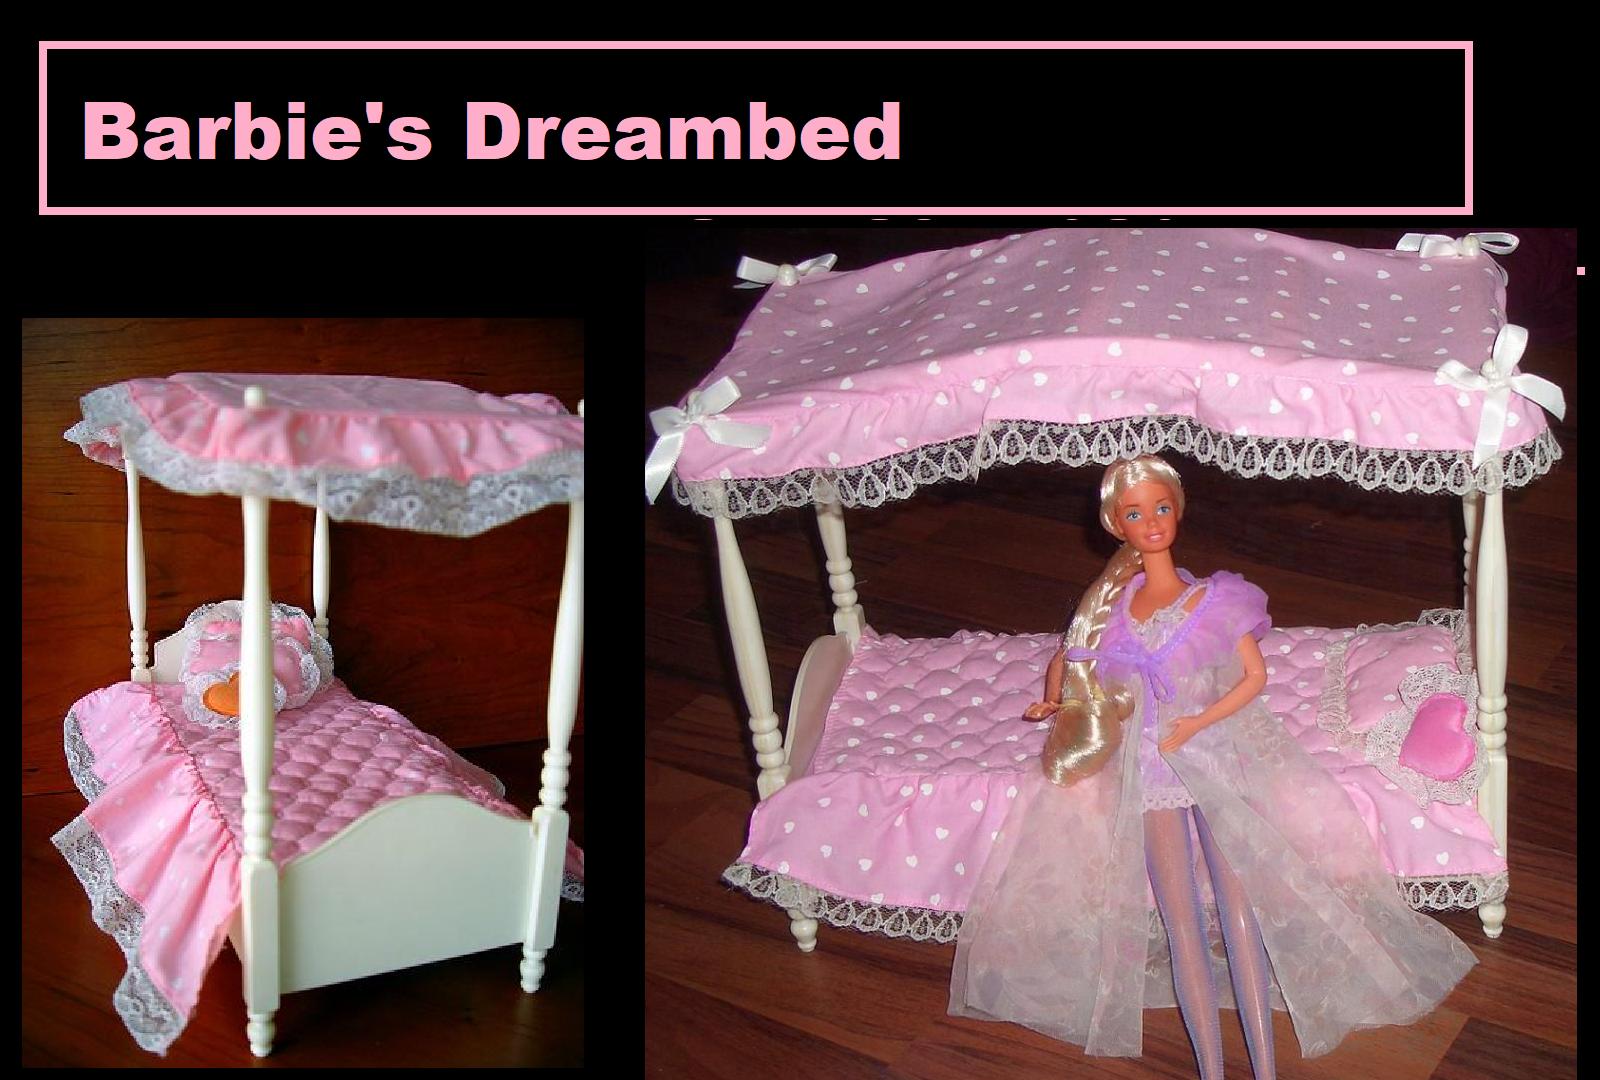 Barbie's Dream bed